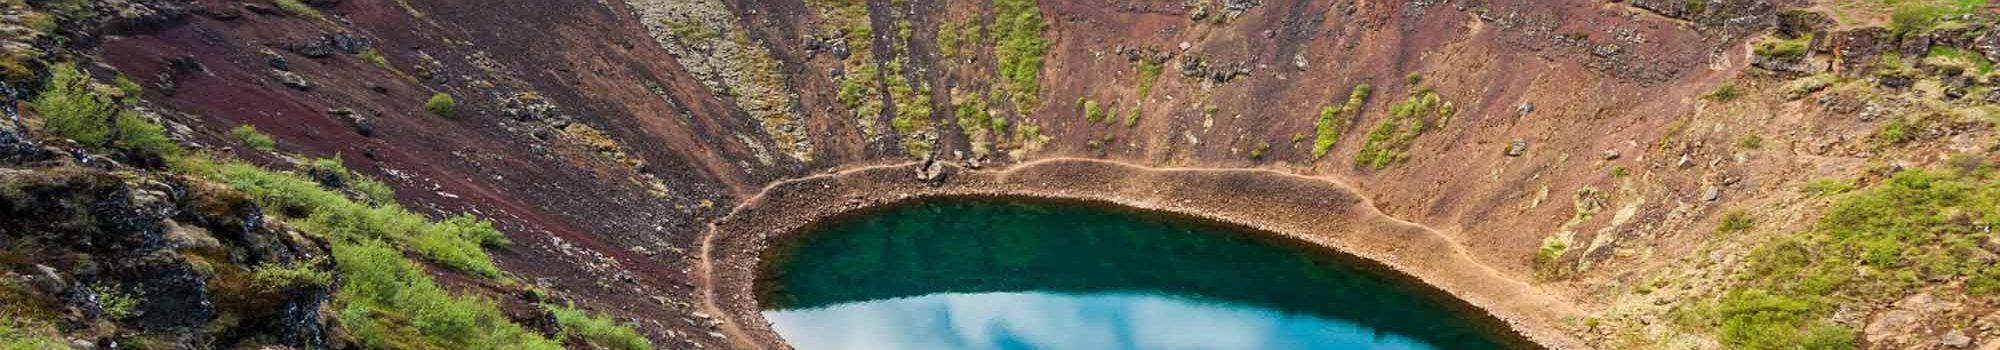 Kerið Kerið Volcanic Crater in Iceland